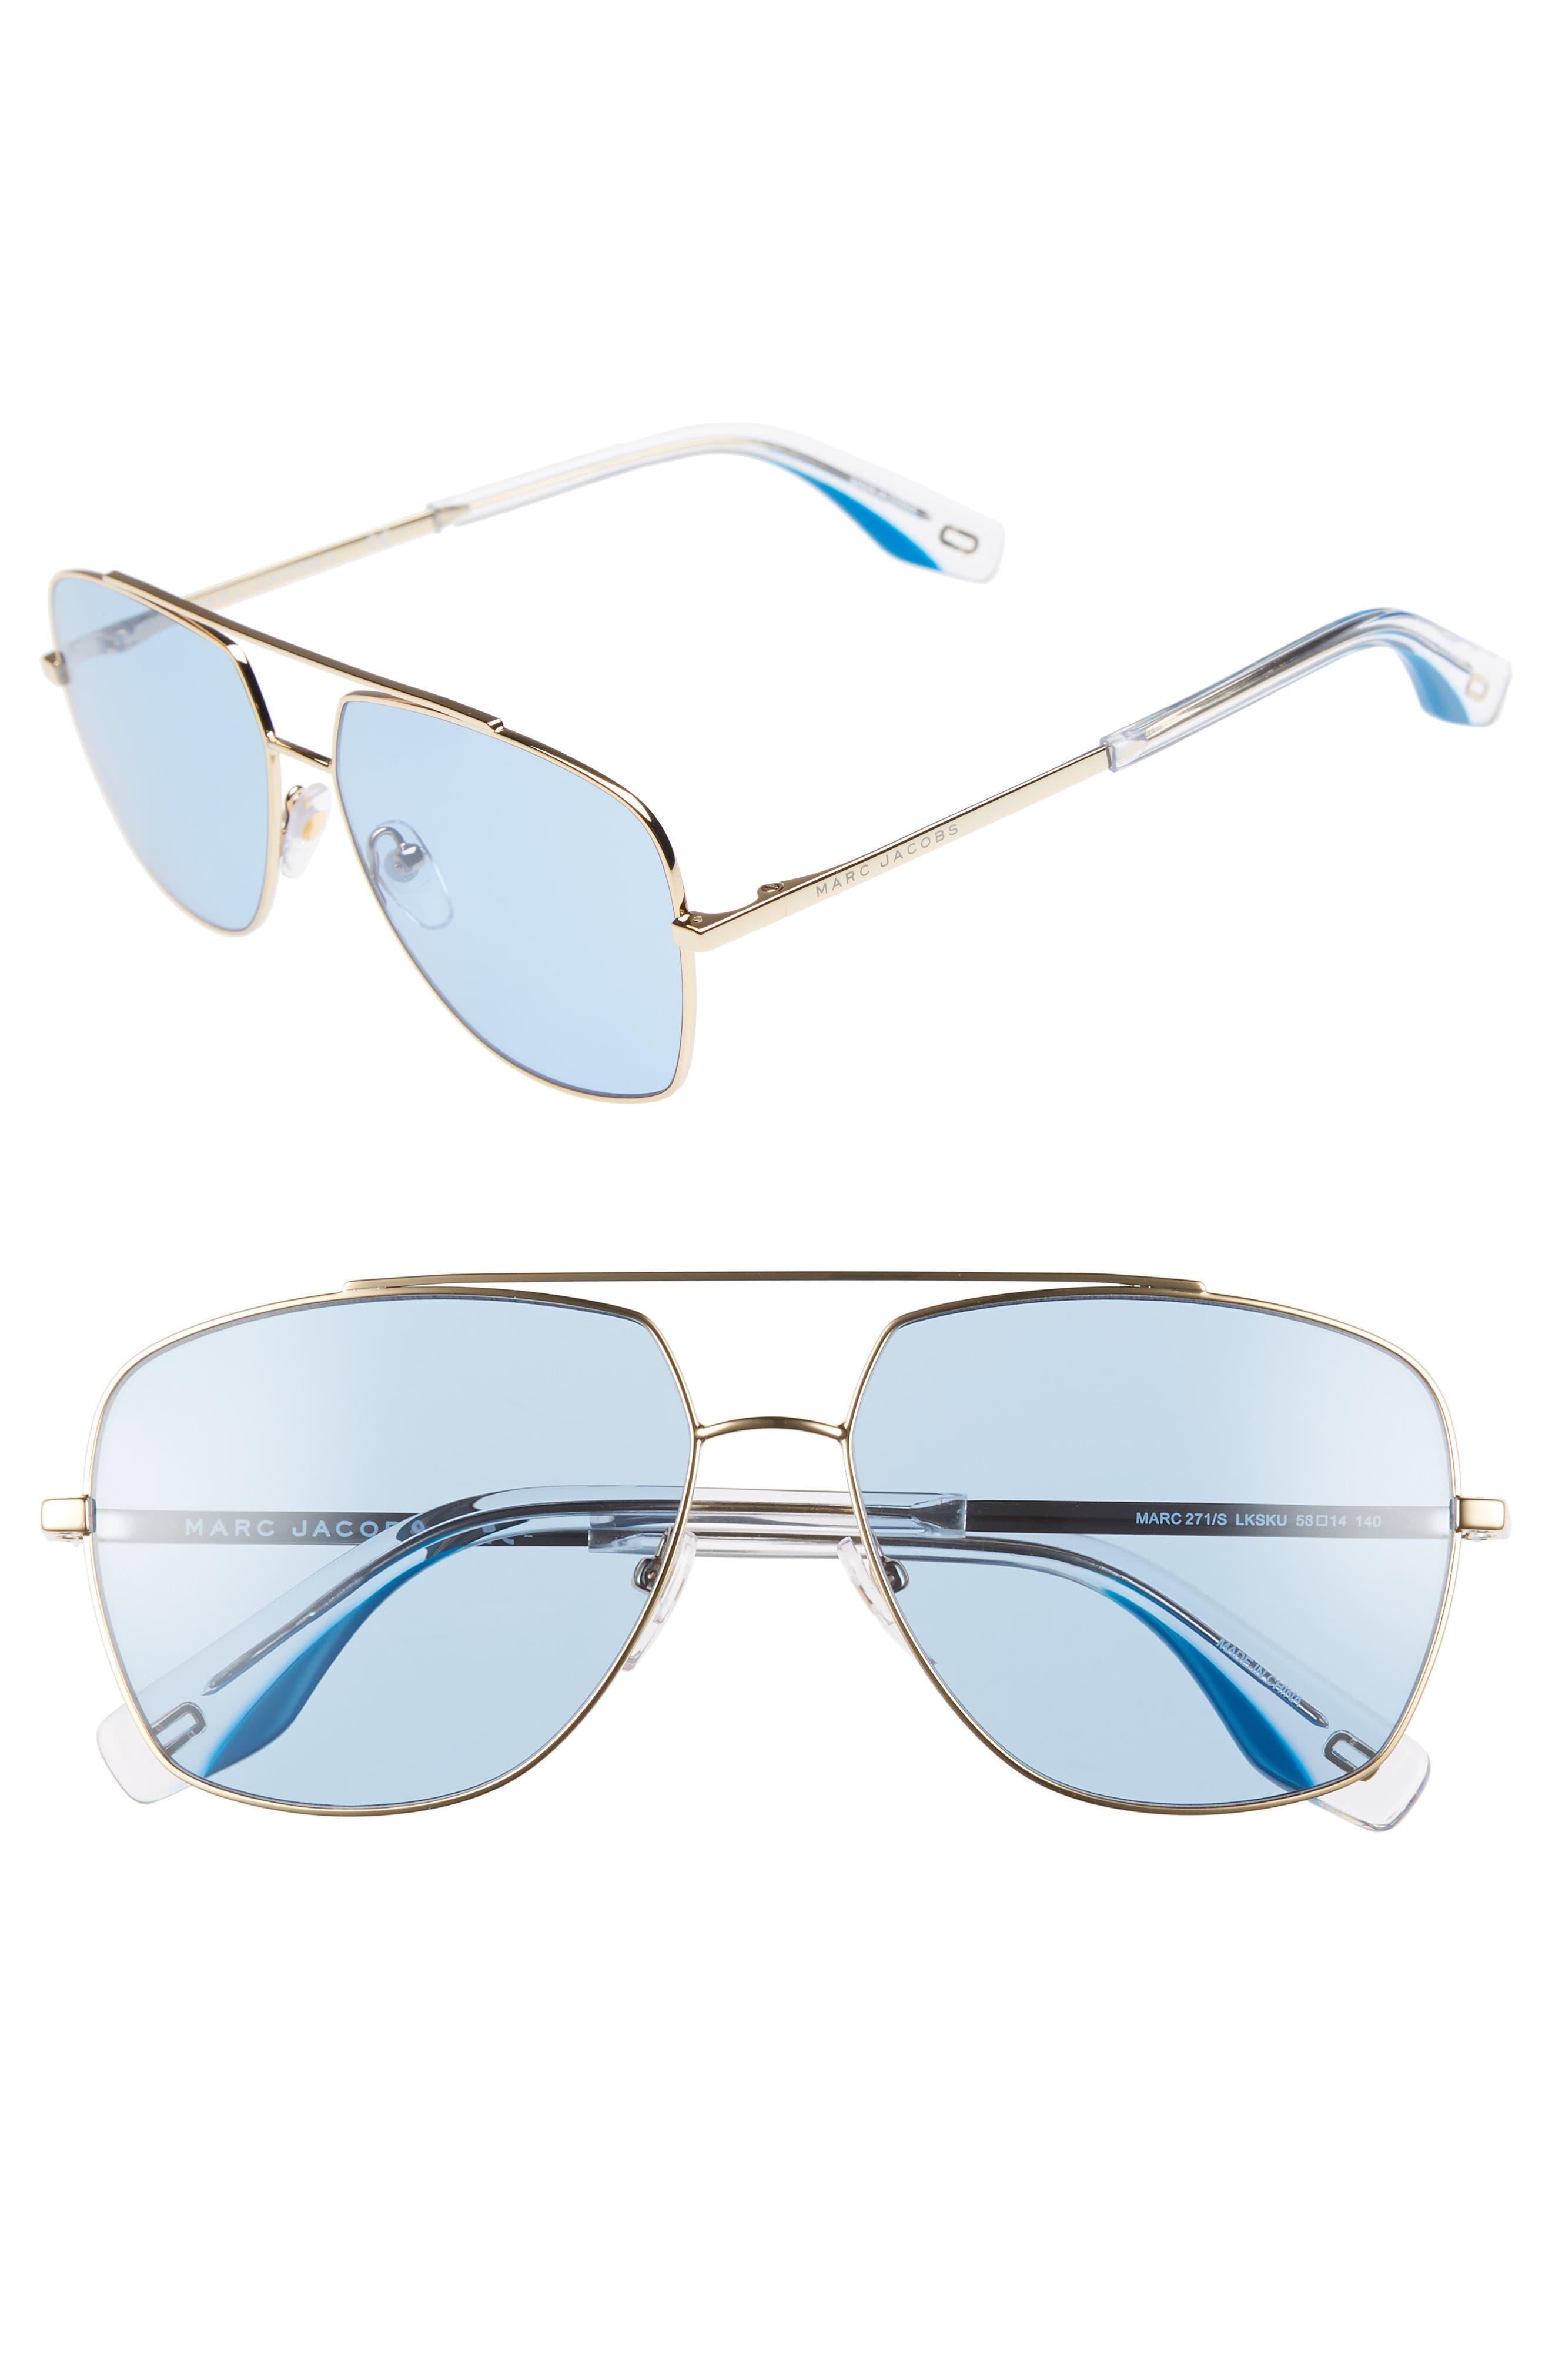 Women'S Brow Bar Aviator Sunglasses, 58Mm in Gold/ Blue